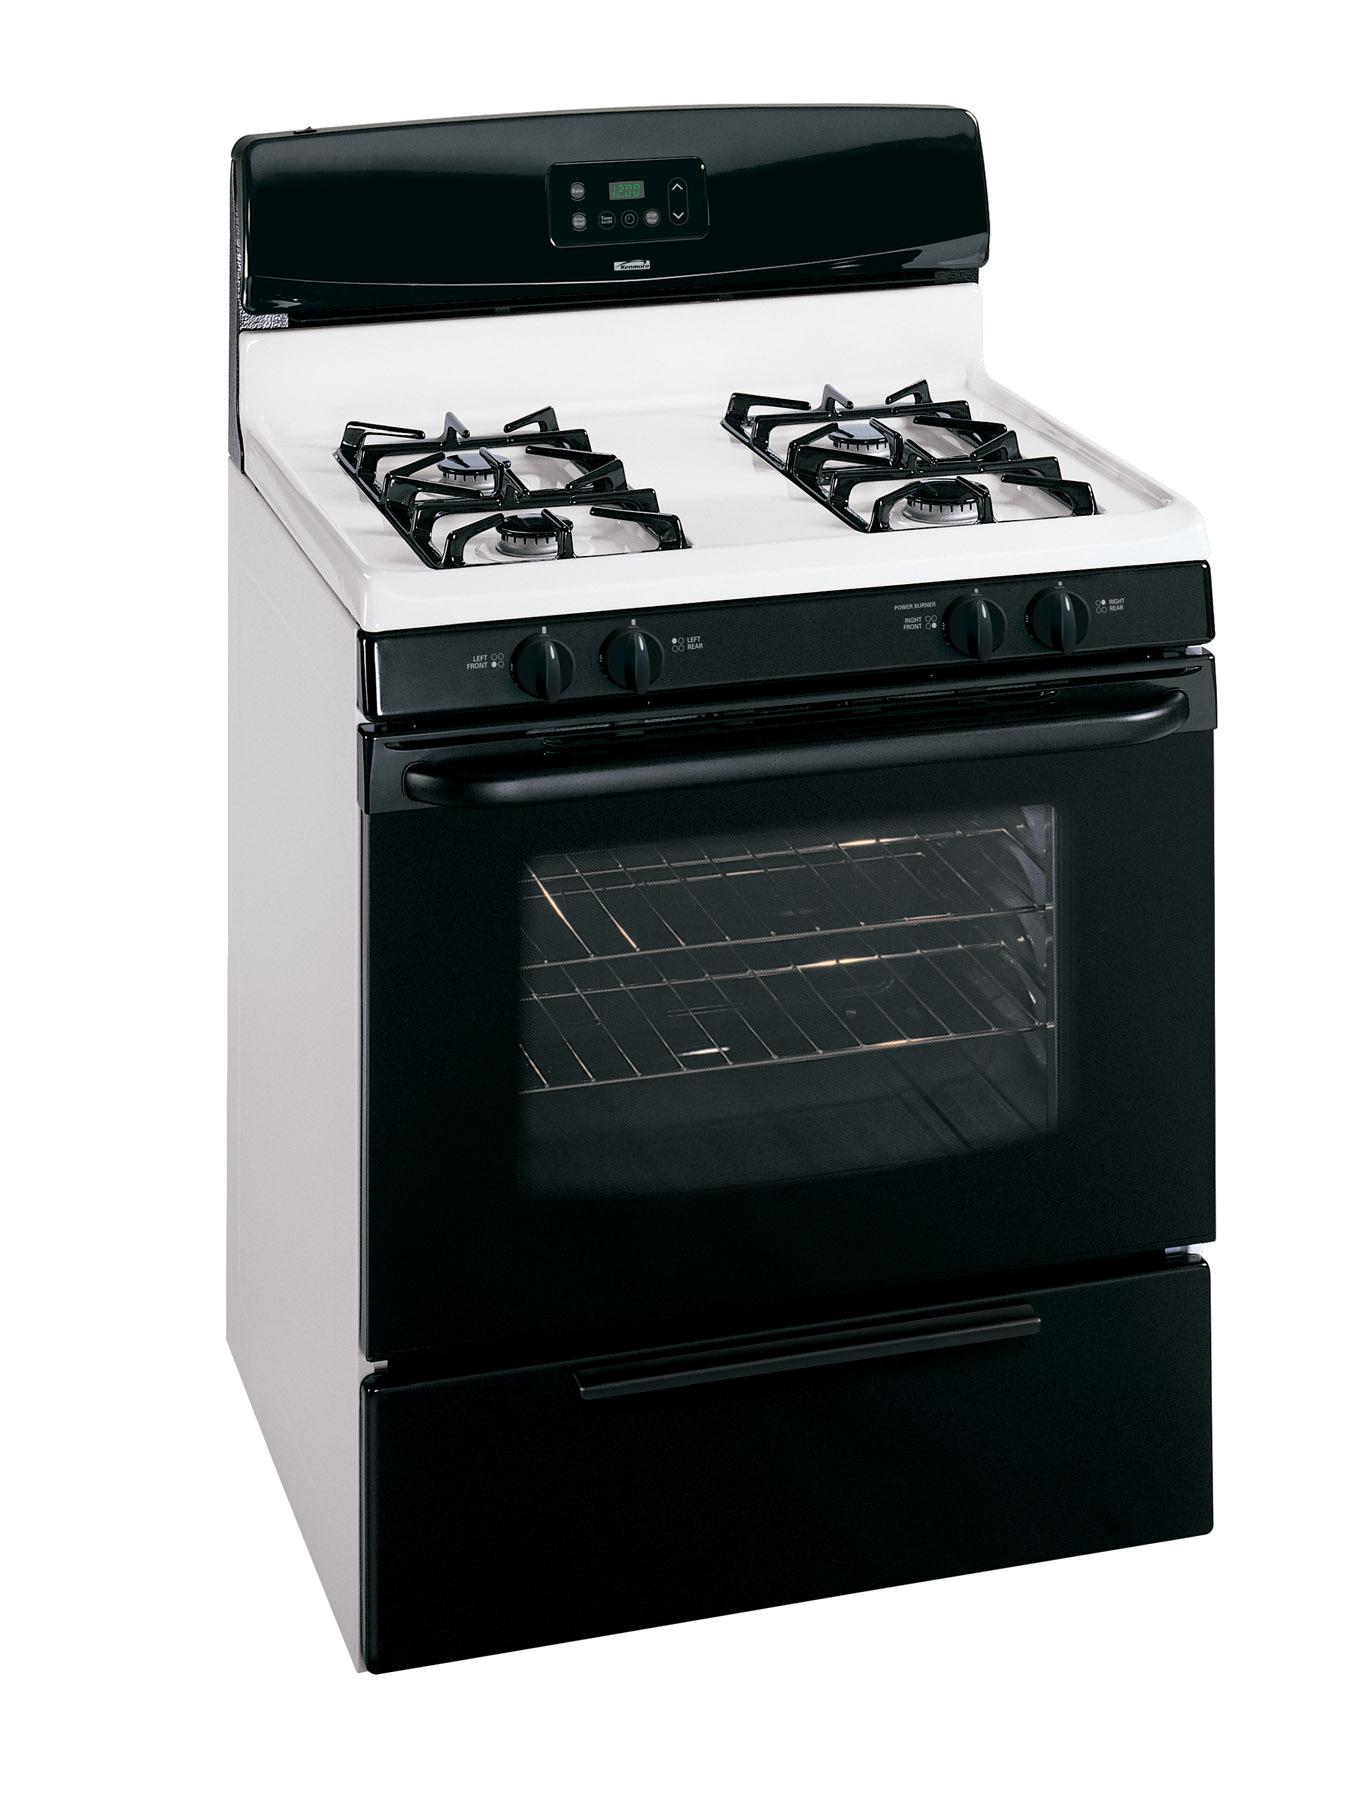 Kenmore Range/Stove/Oven Model 790.71201700 Parts